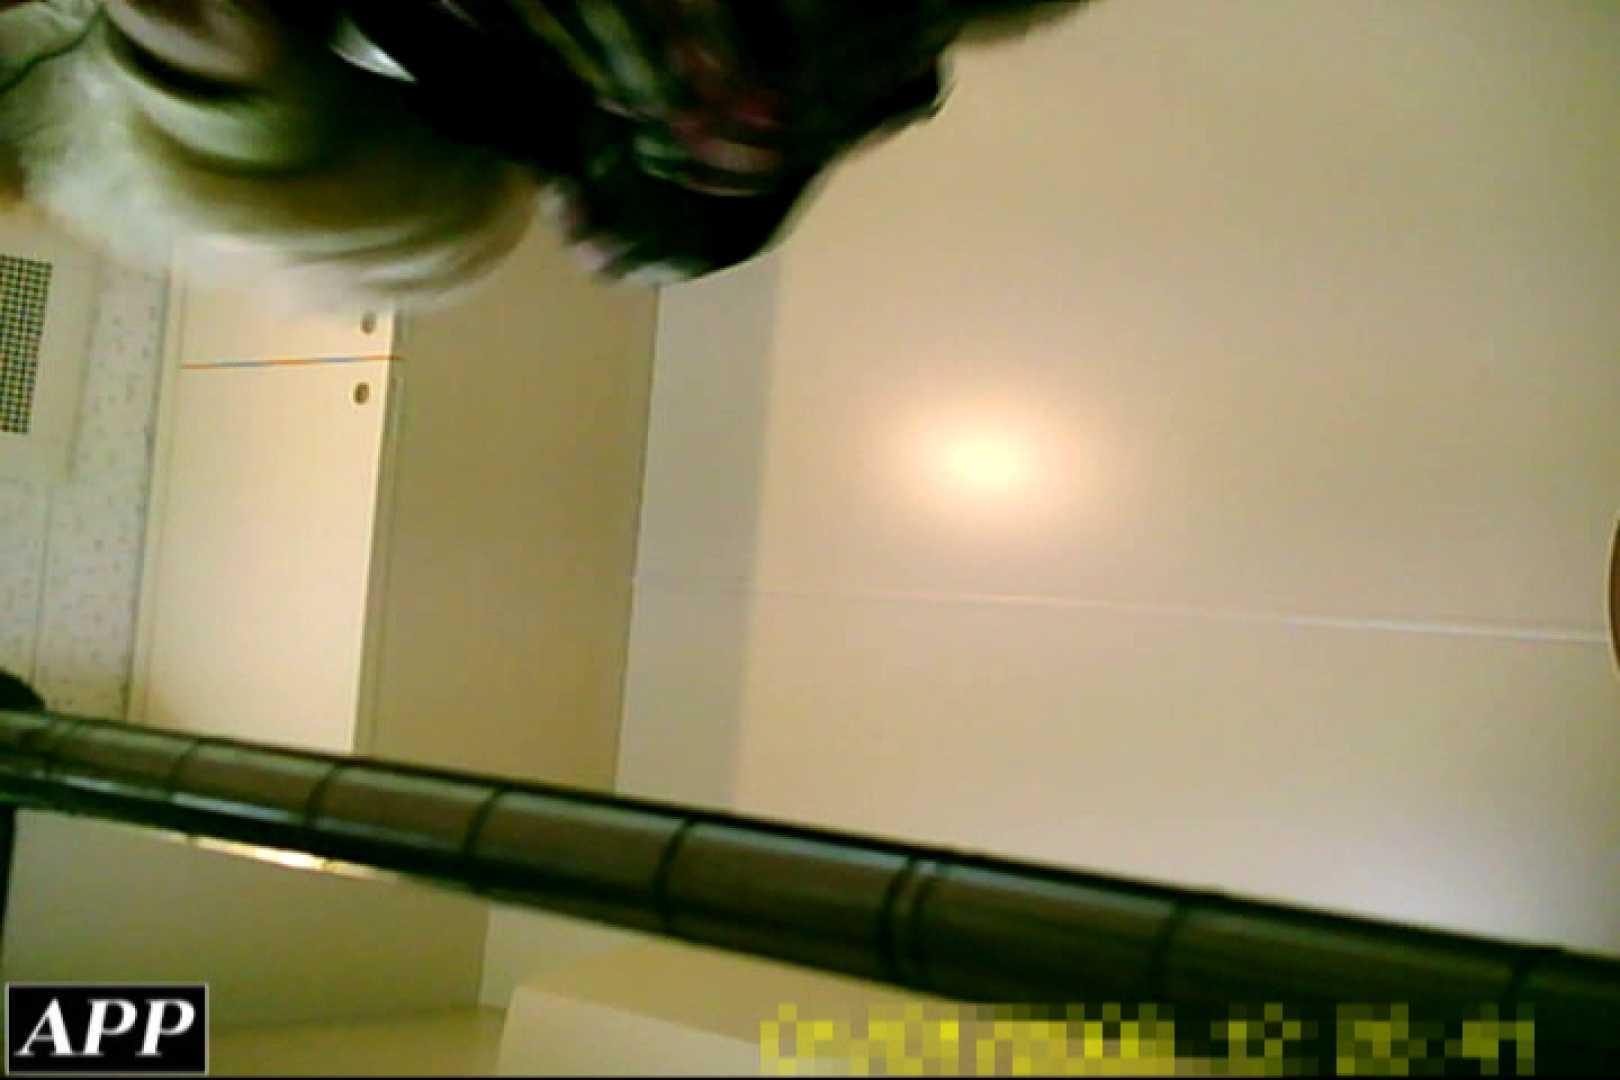 3視点洗面所 vol.57 OLハメ撮り  76Pix 5